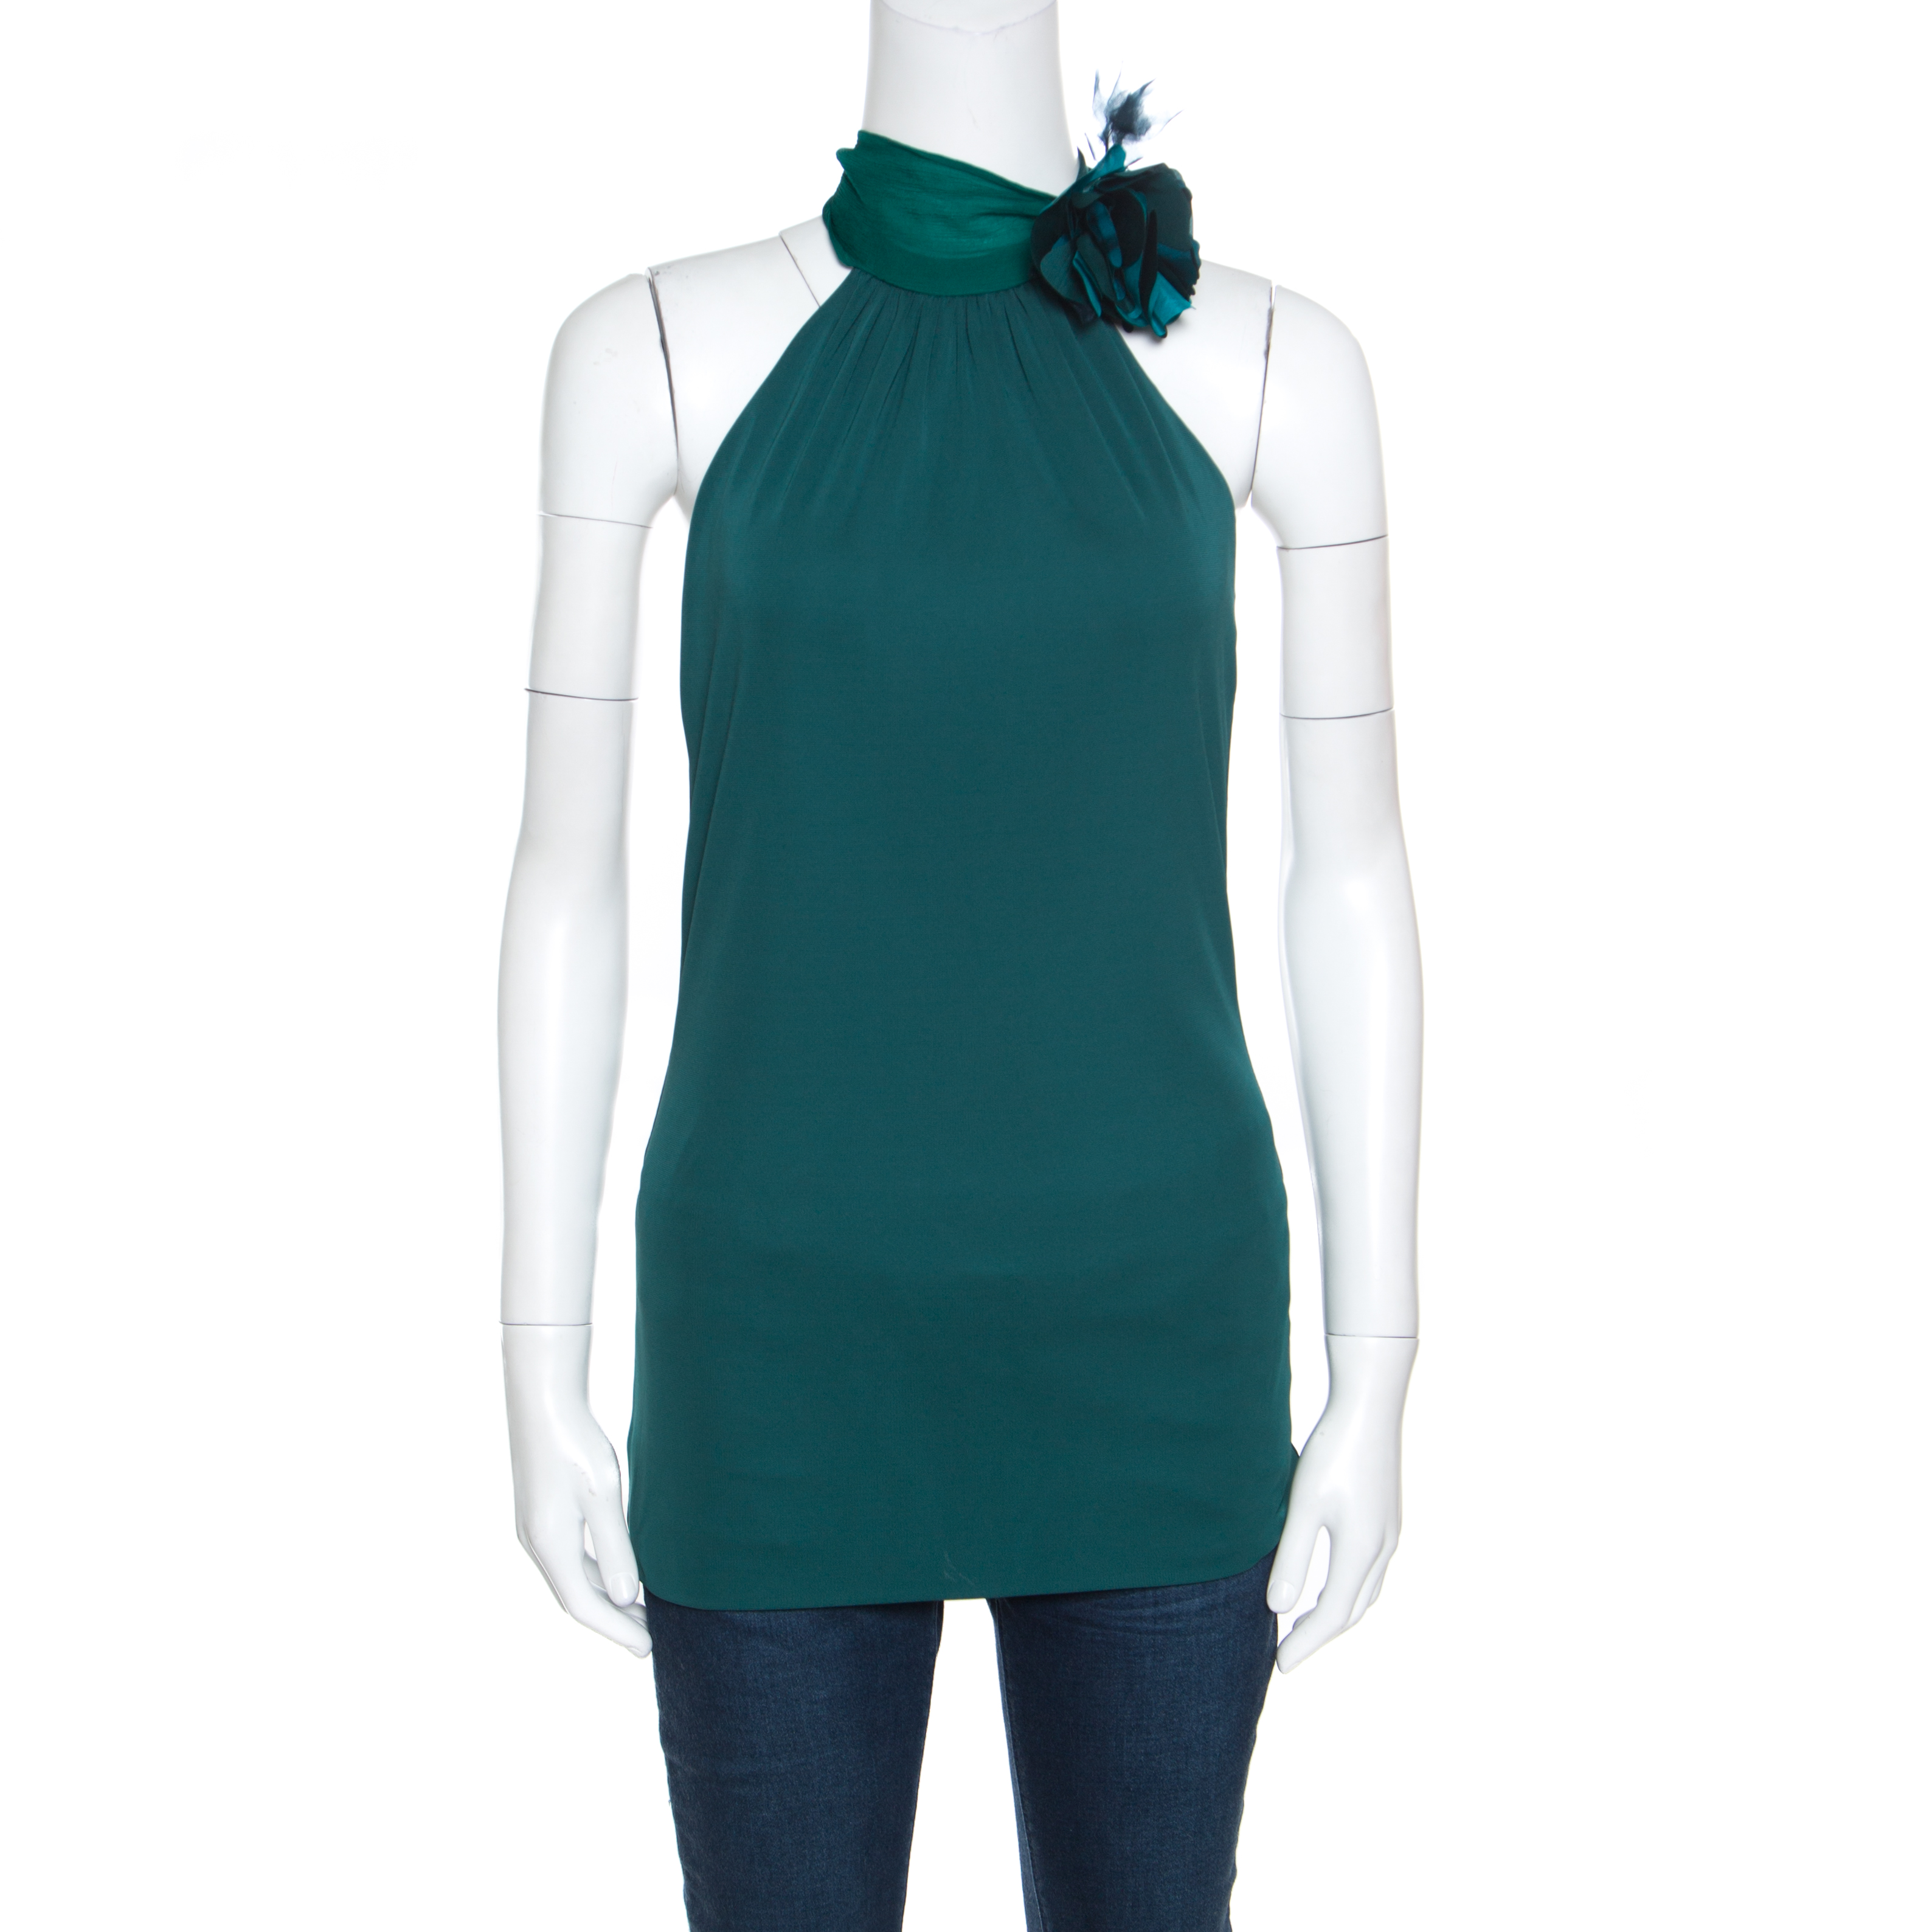 Купить со скидкой Gucci Emerald Green Knit Silk Orchid Flower Applique Halter Top L